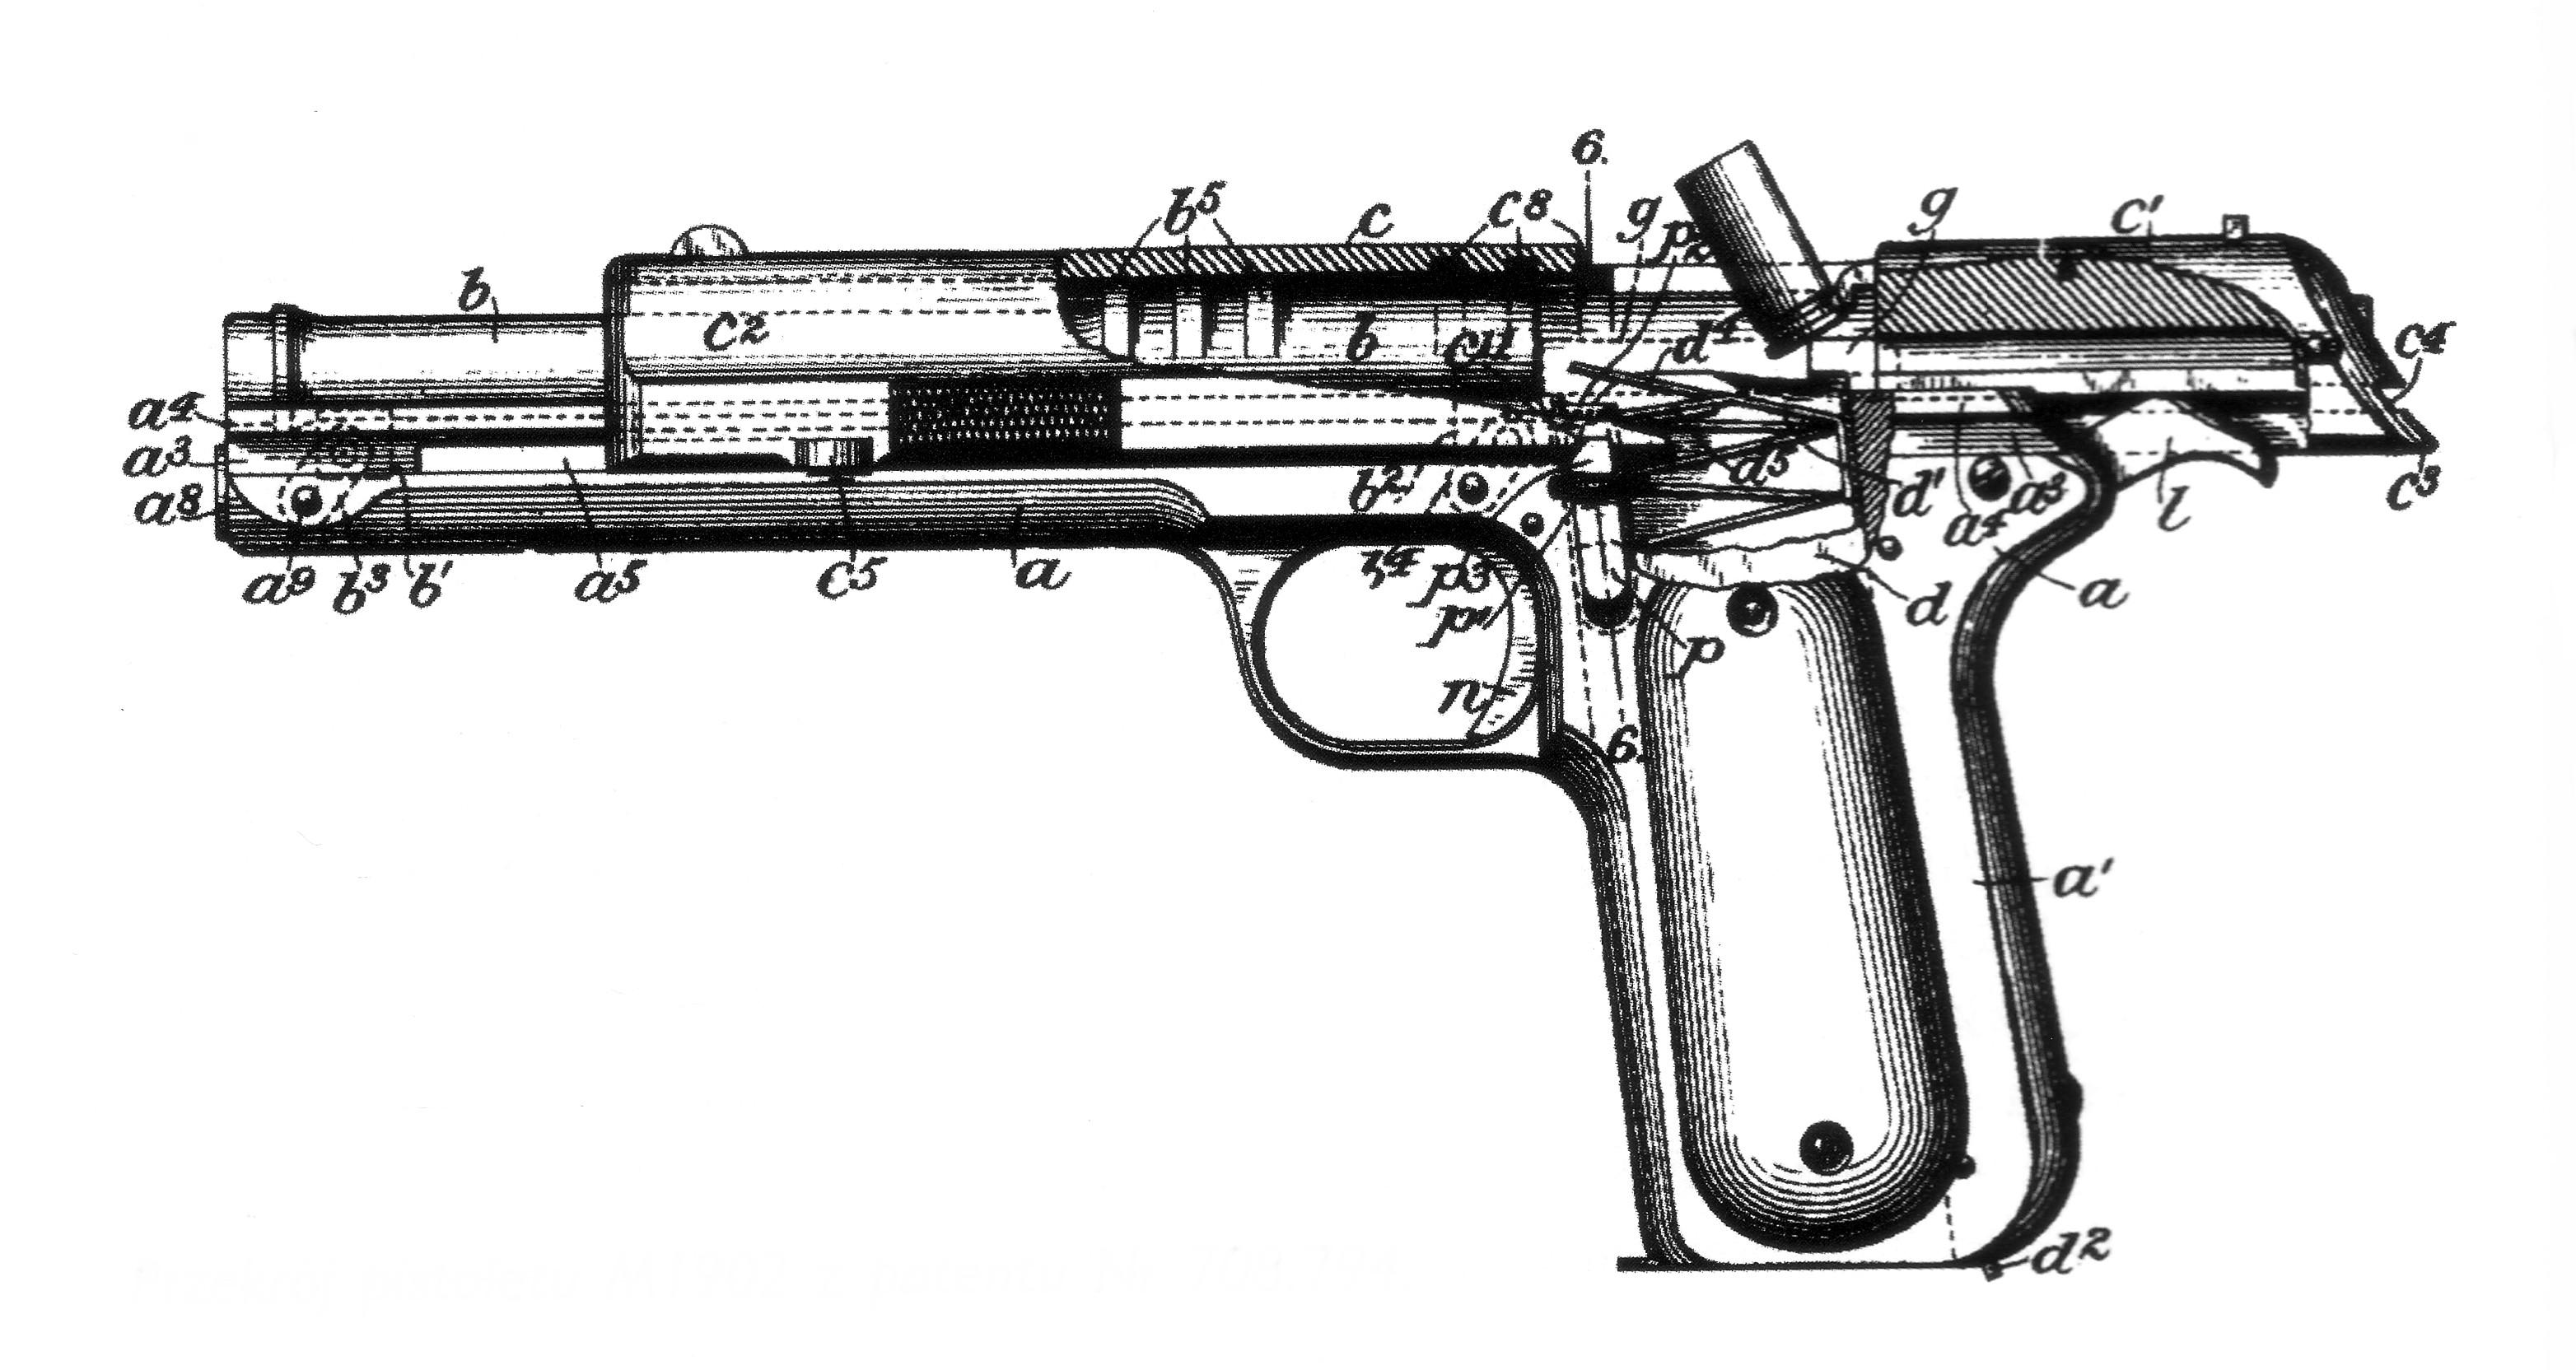 M1902 Colt Automatic Pistol in .38 Automatic (.38ACP